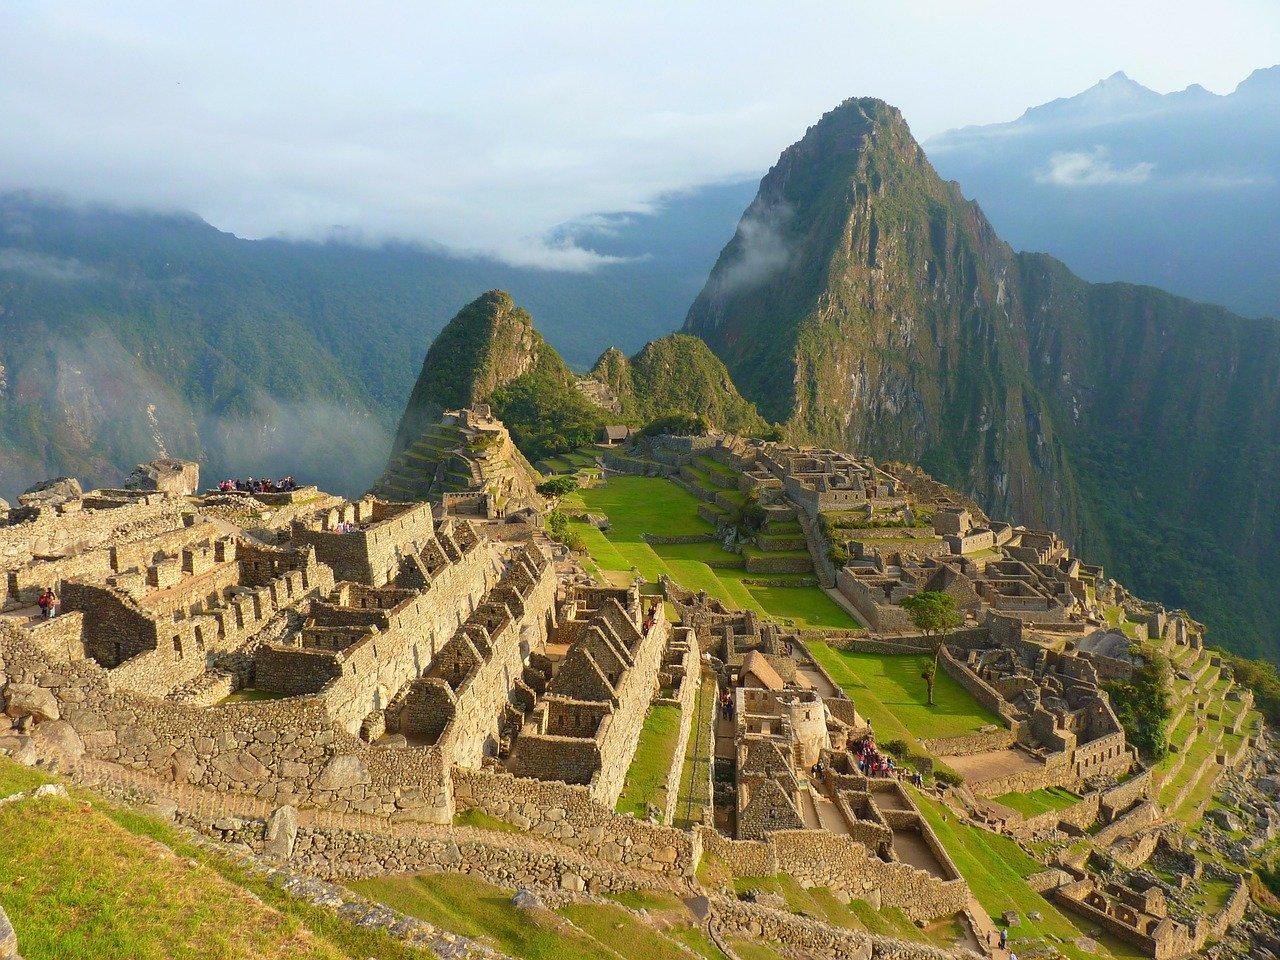 The Top 5 Reasons to Visit Peru